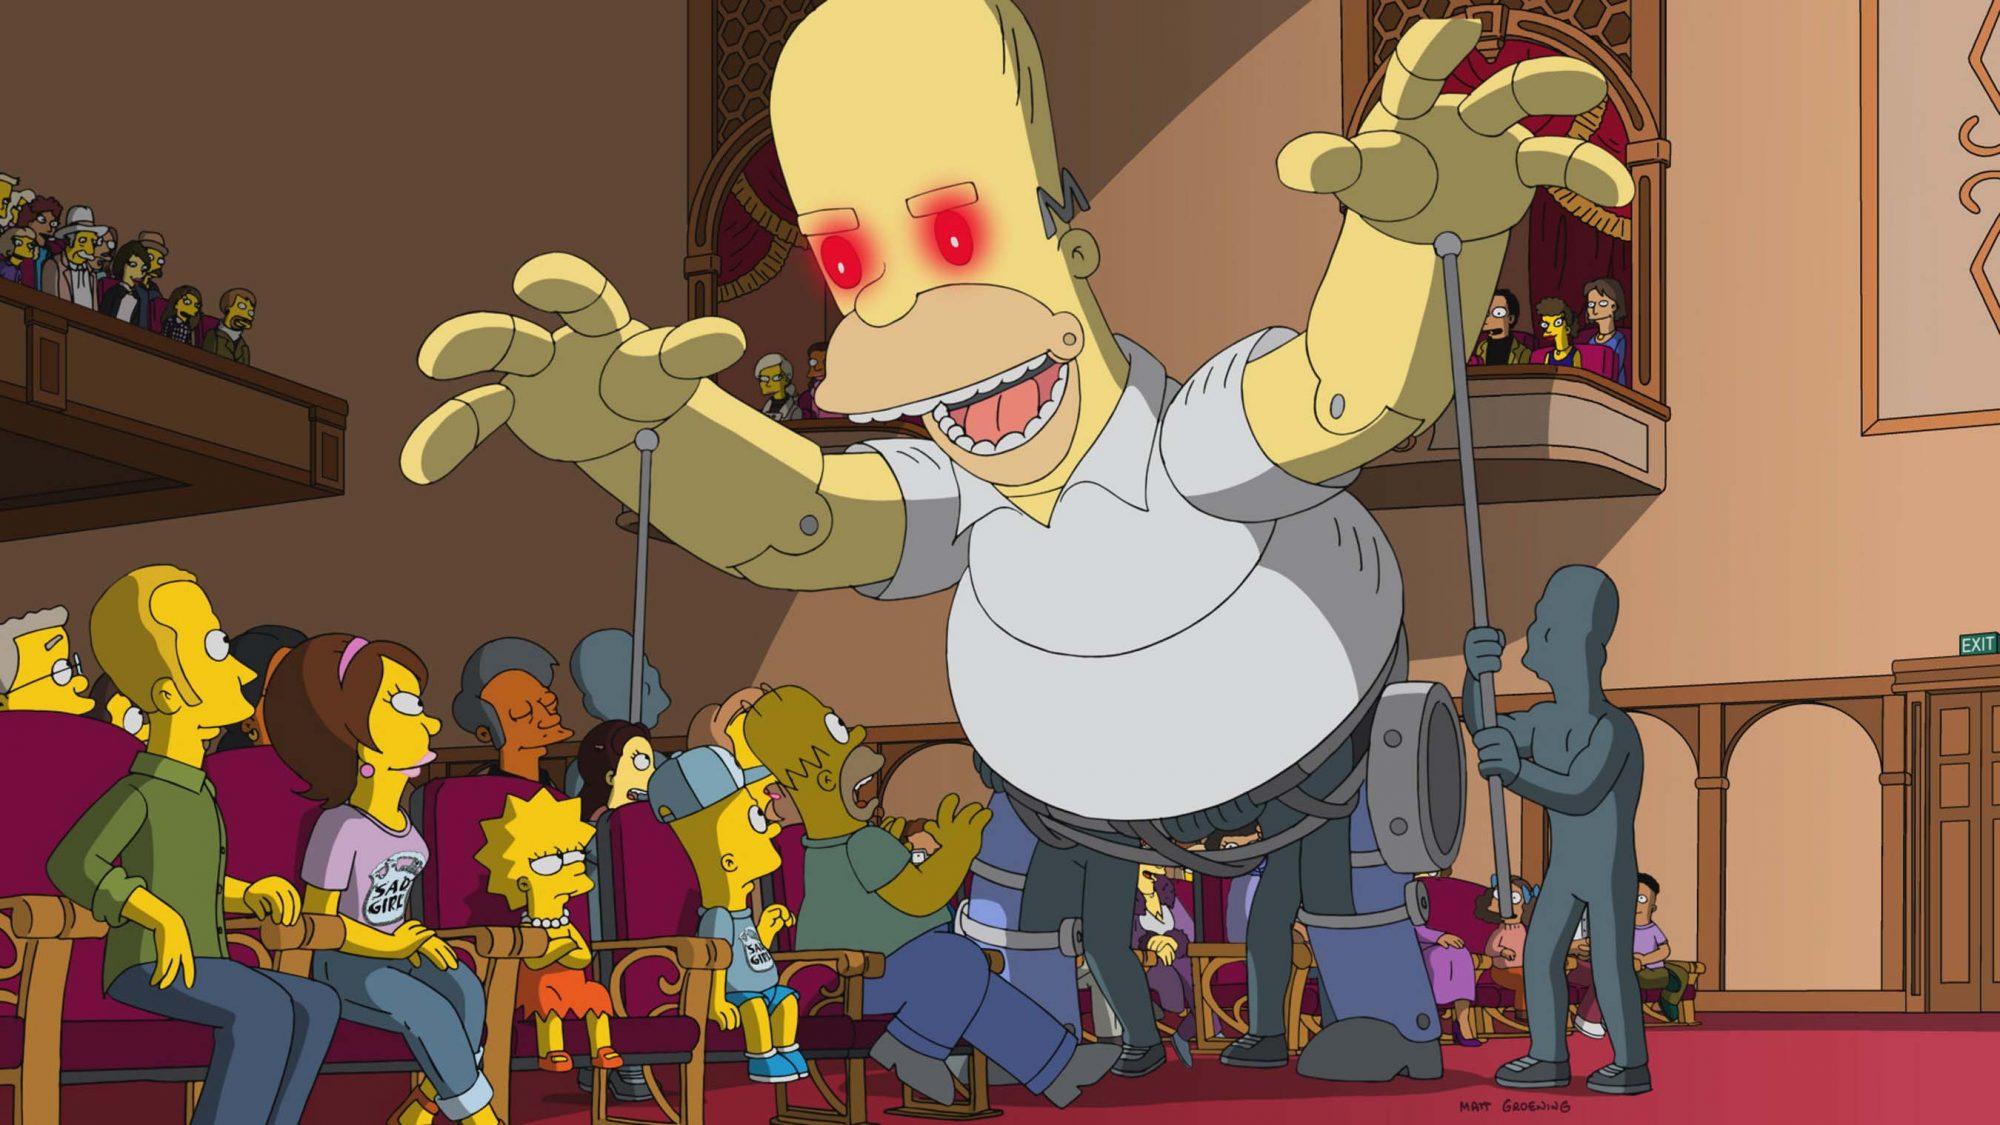 Simpsons_2822_SpringfieldSplendor_Sc_3044_Avid_Color_Corrected